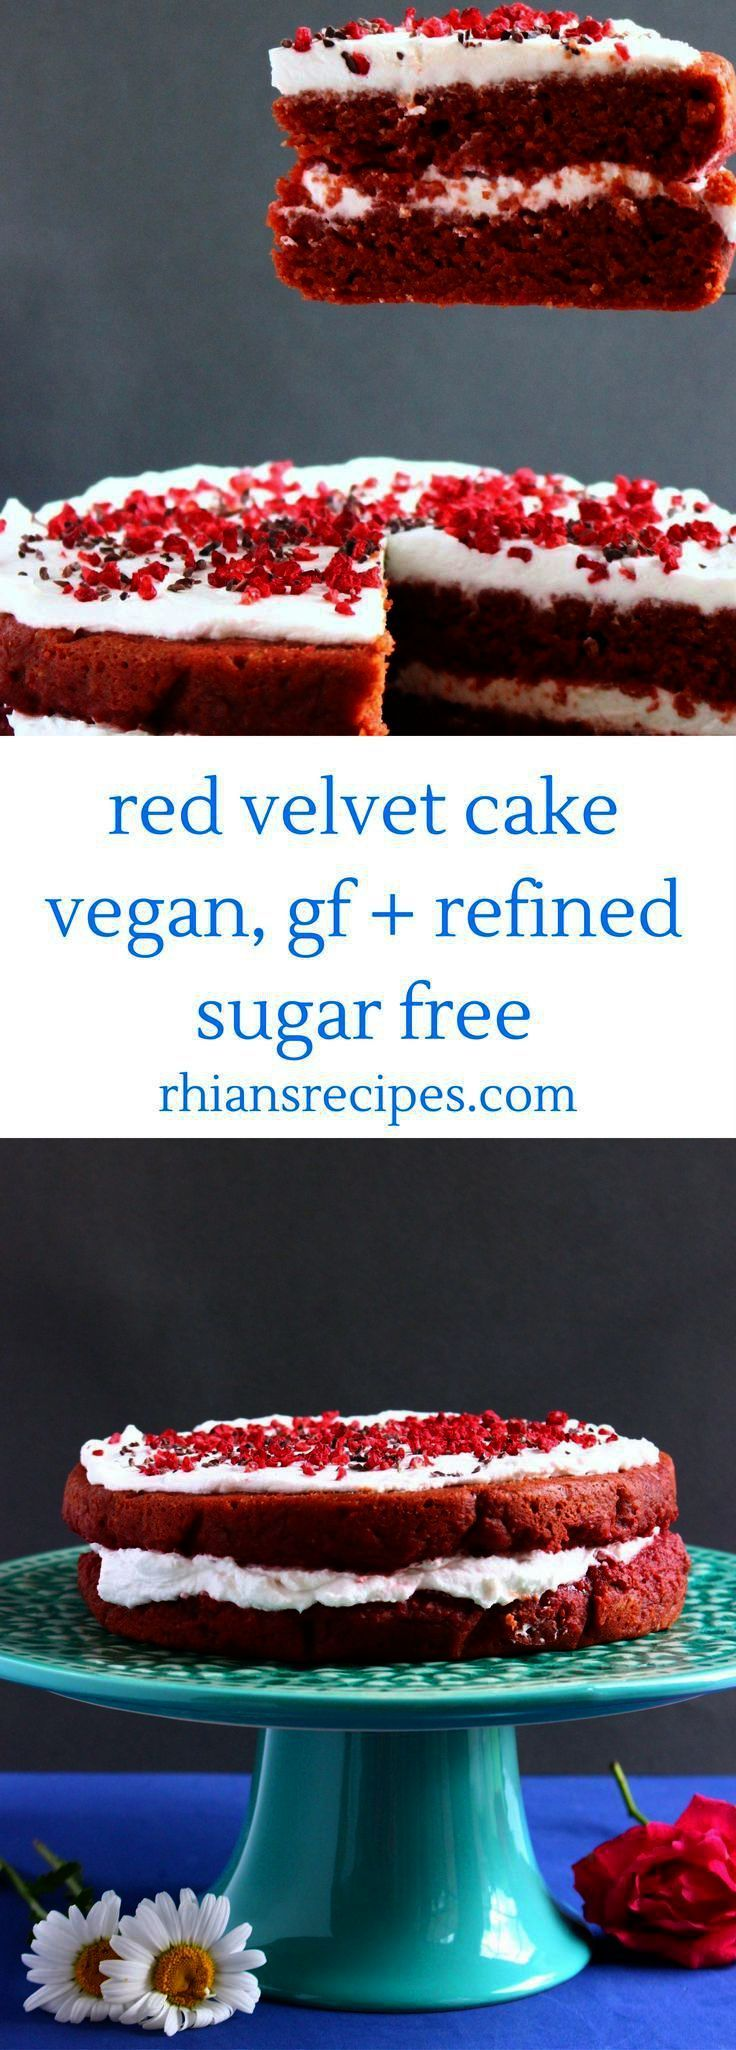 Homemade Desserts For Diabetics rather Gluten Free